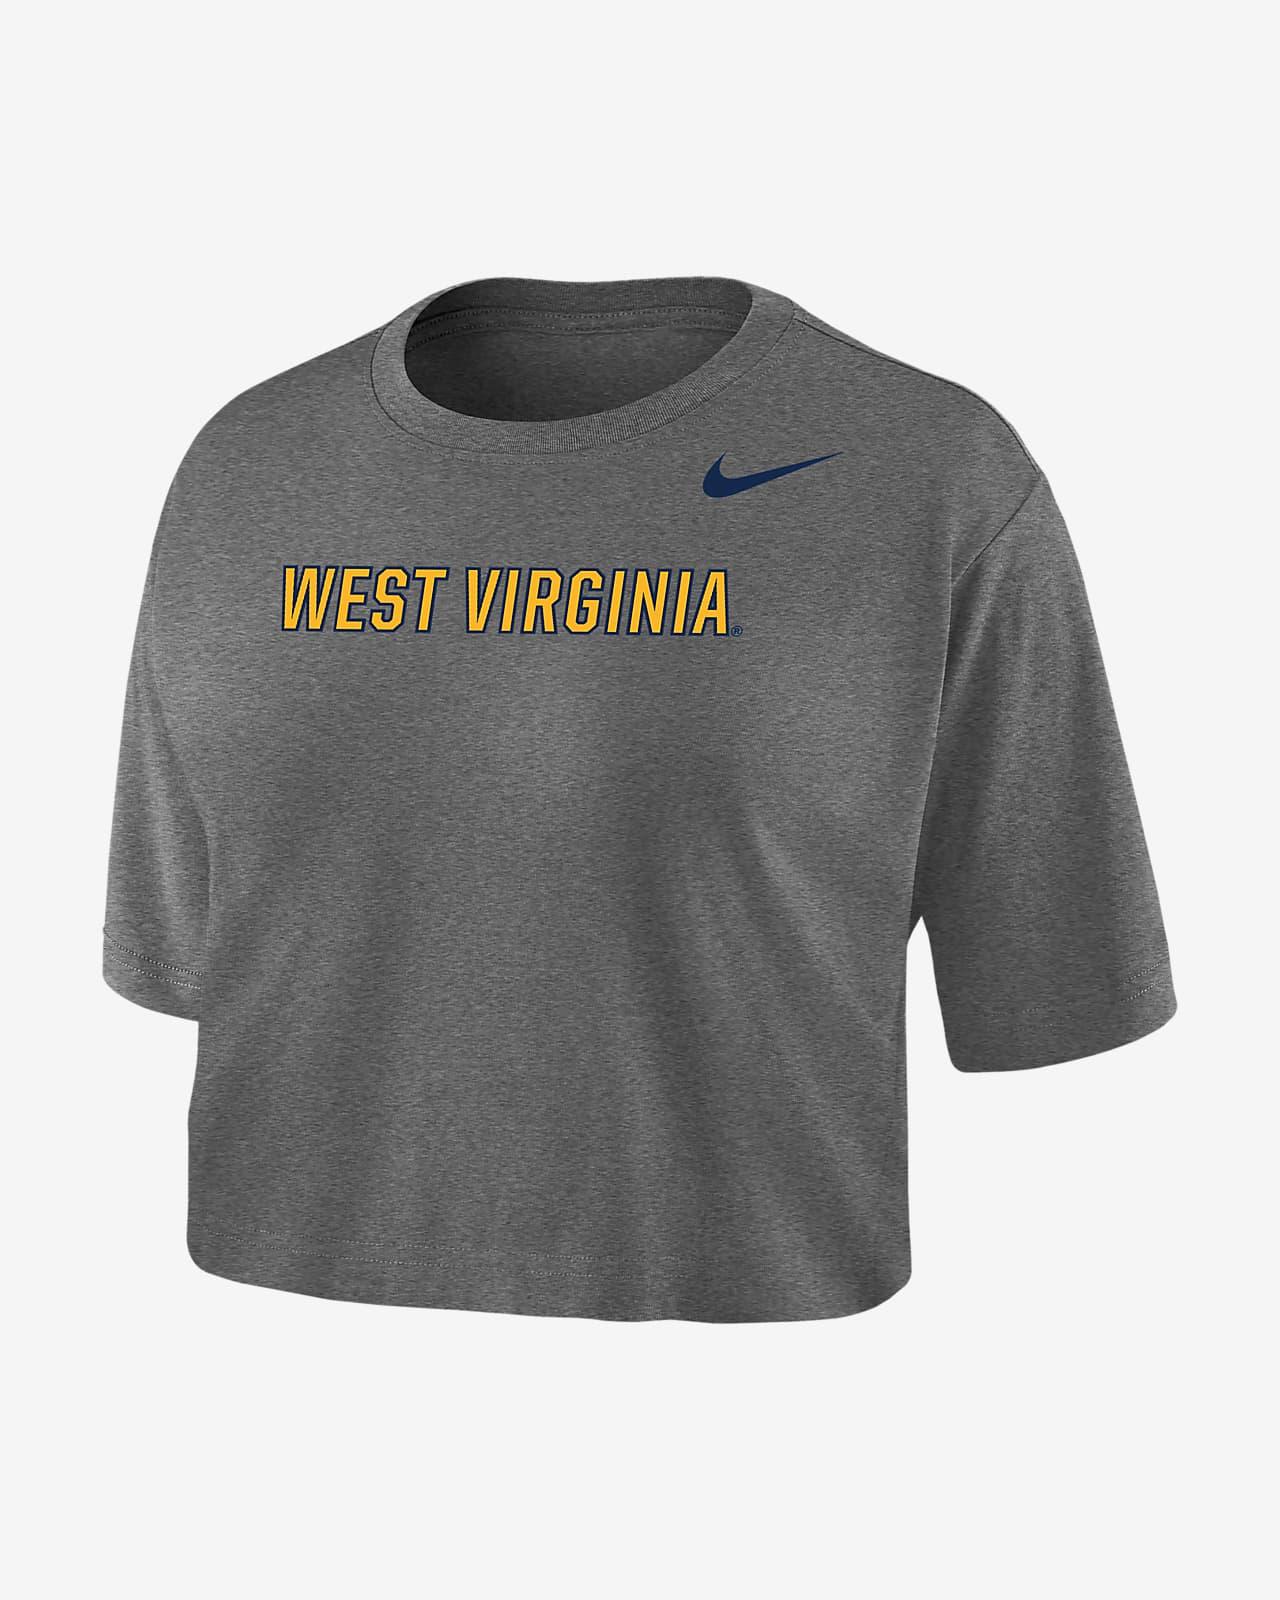 Nike College Dri-FIT (West Virginia) Women's Crop T-Shirt